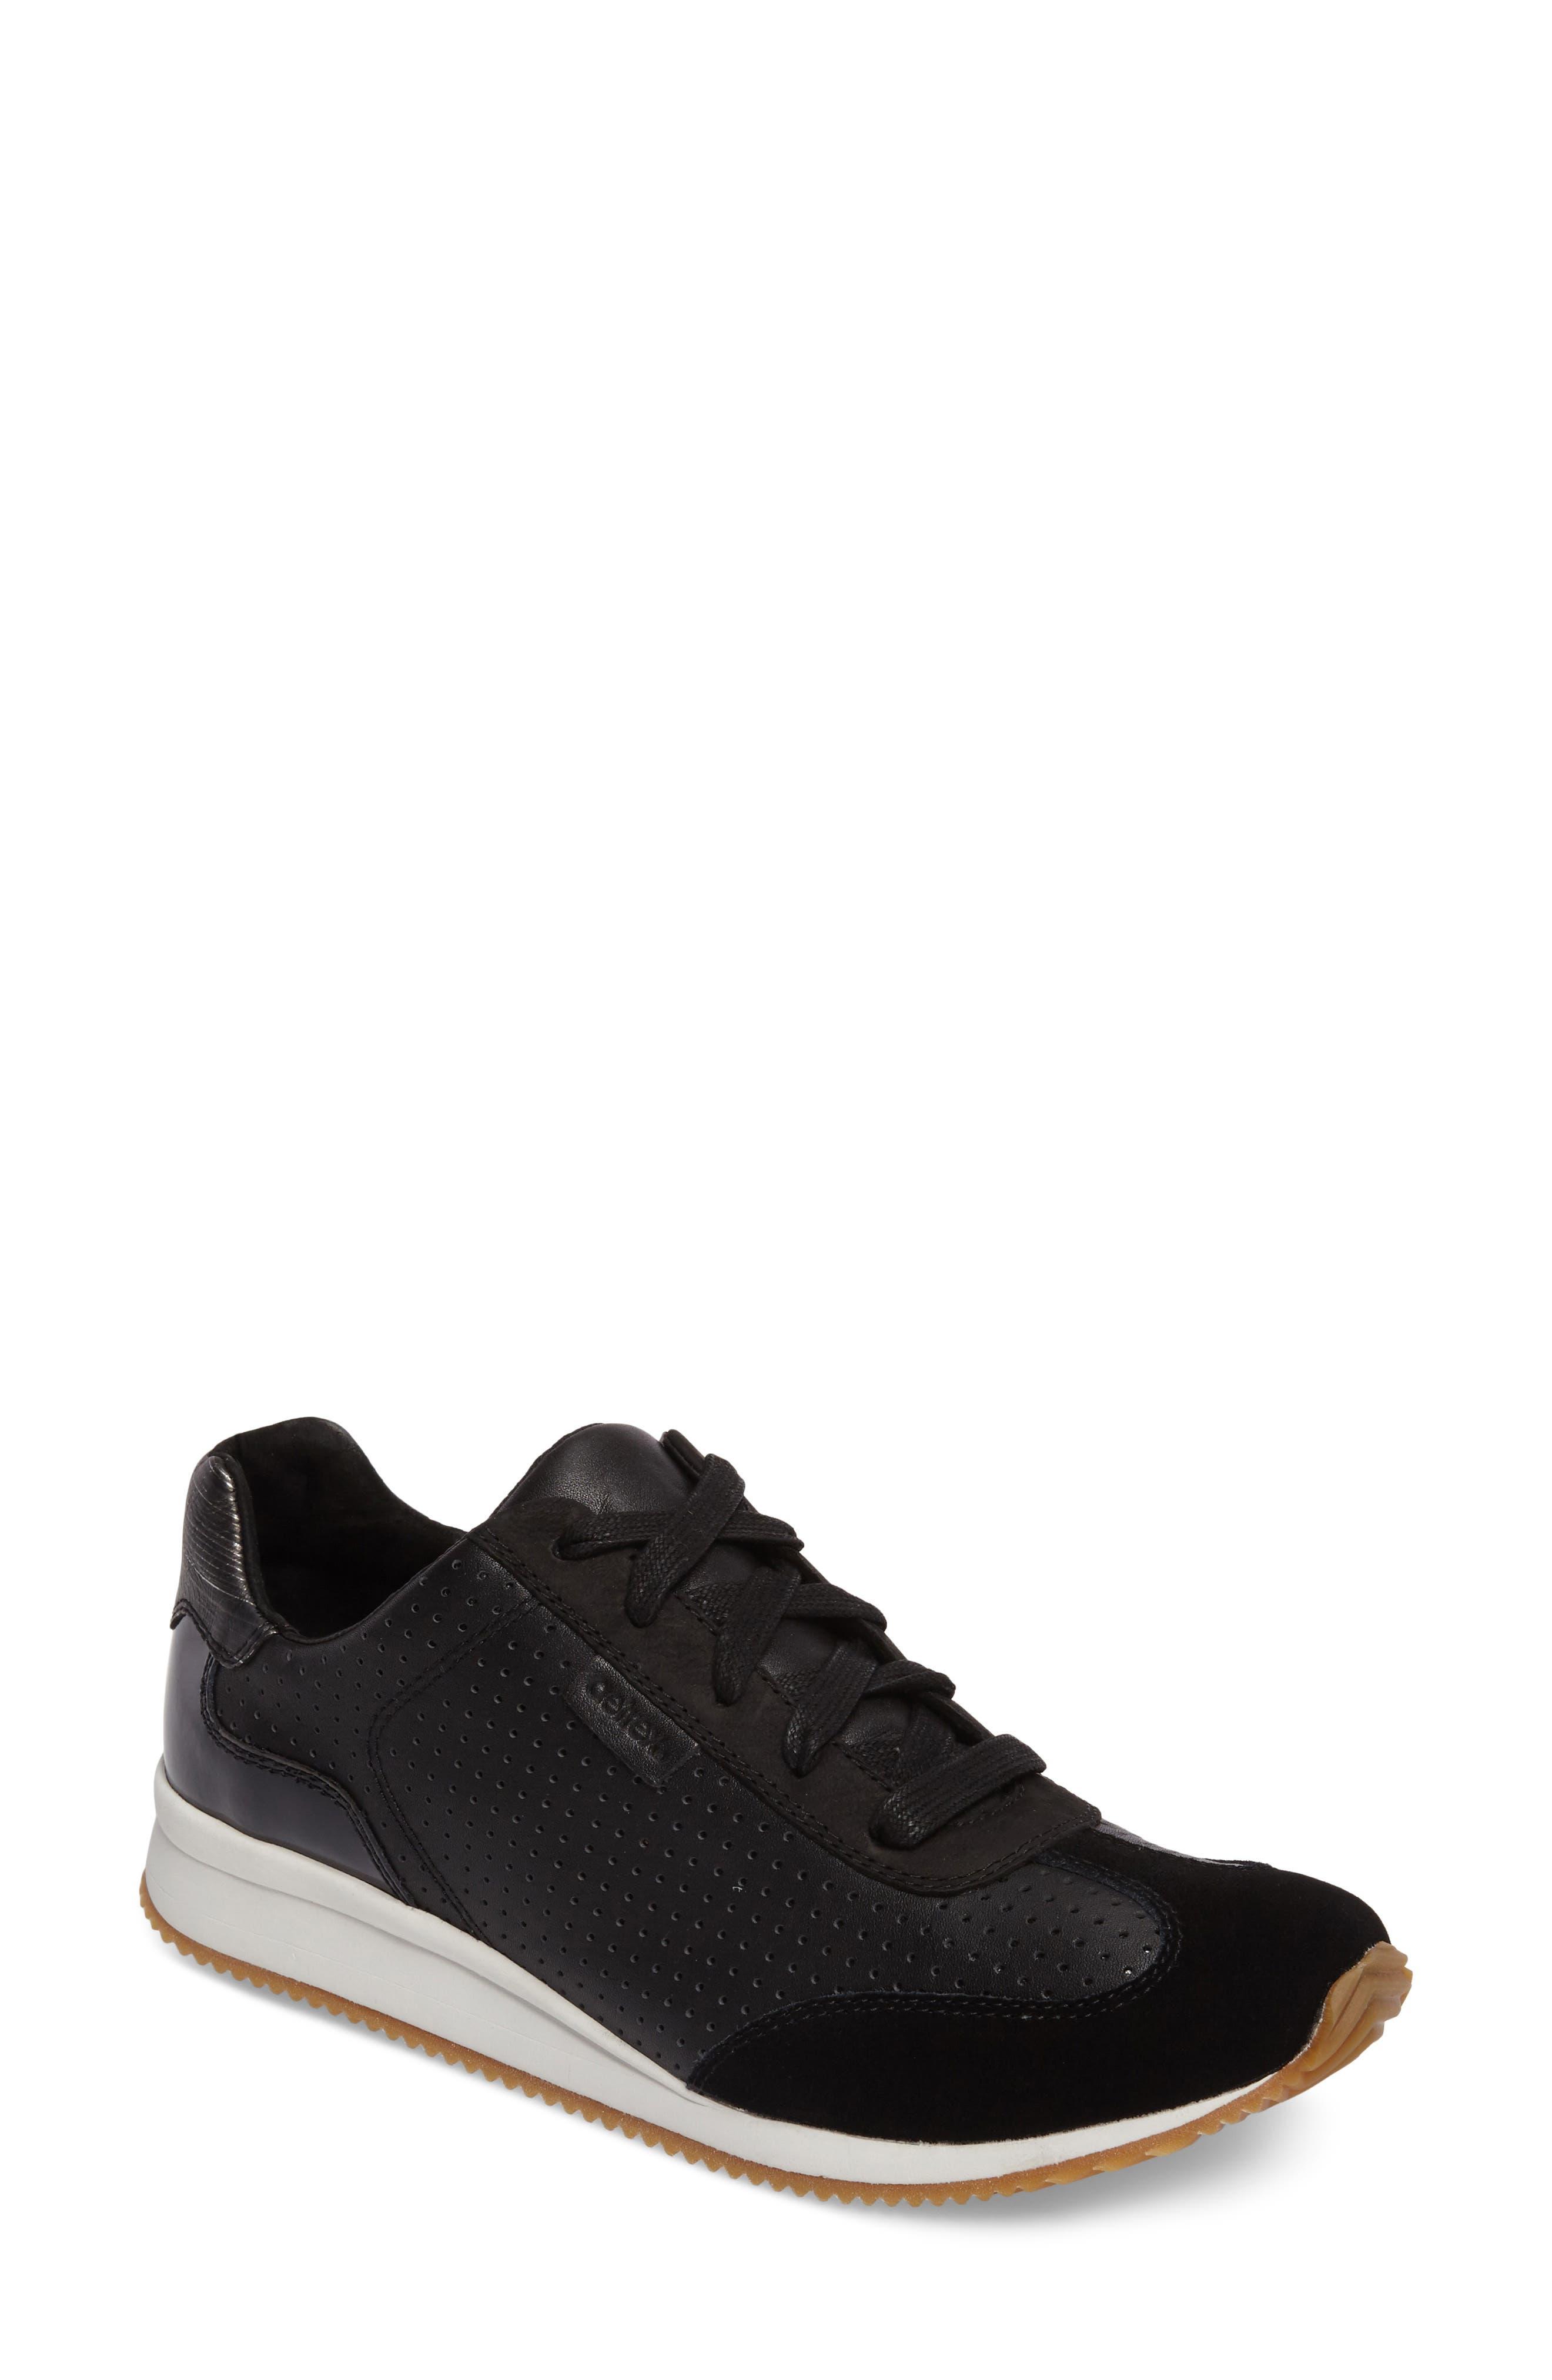 Nadia Sneaker,                         Main,                         color, BLACK LEATHER